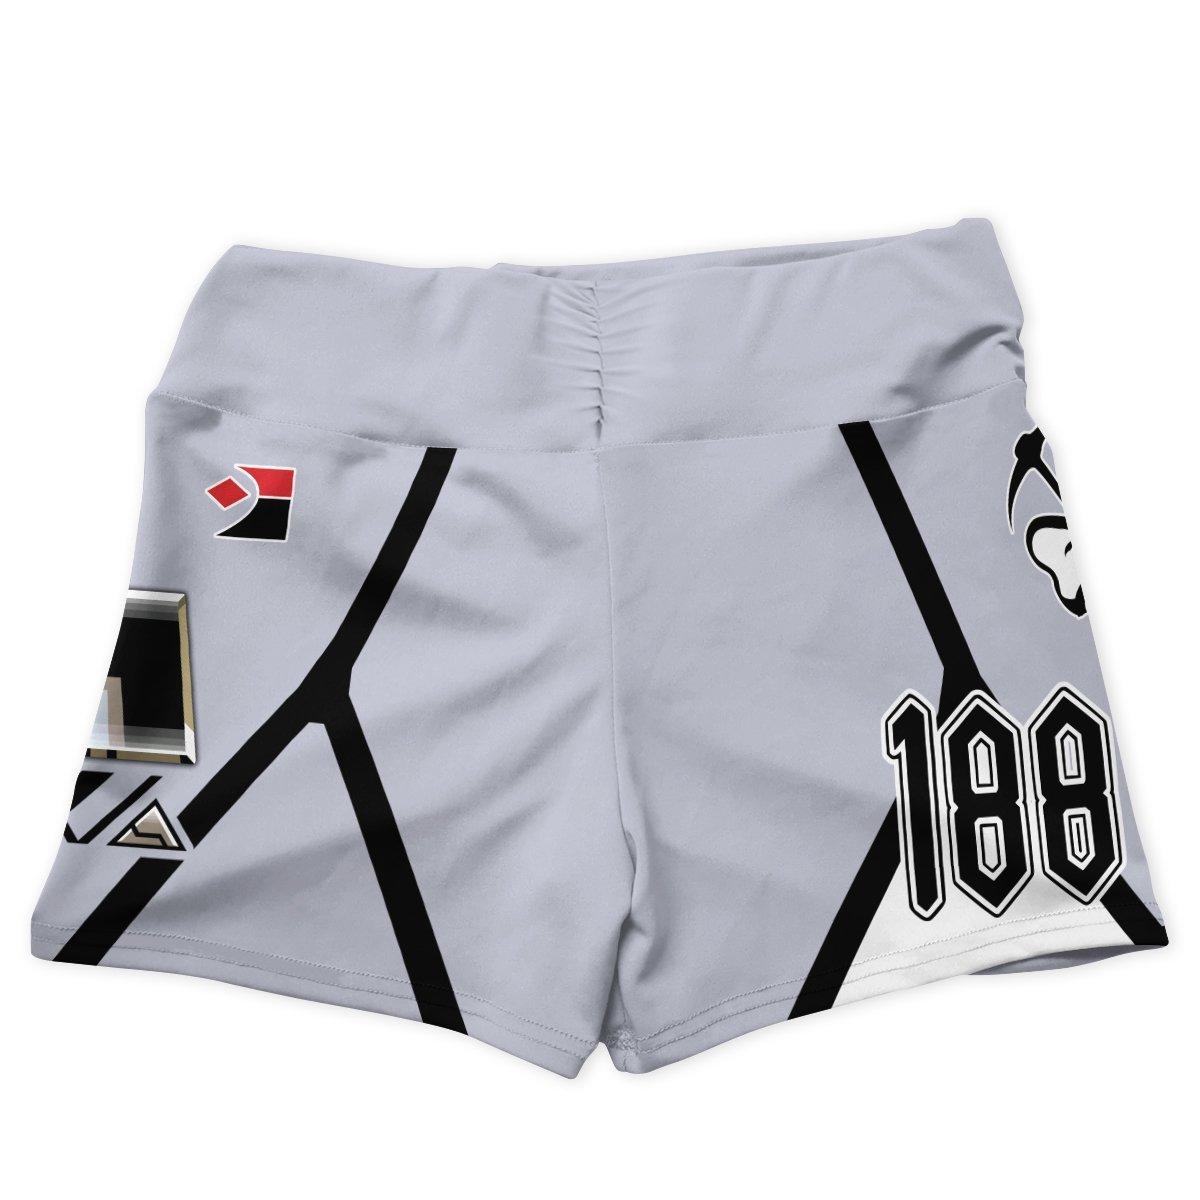 pokemon rock uniform active wear set 236461 - Anime Swimsuits